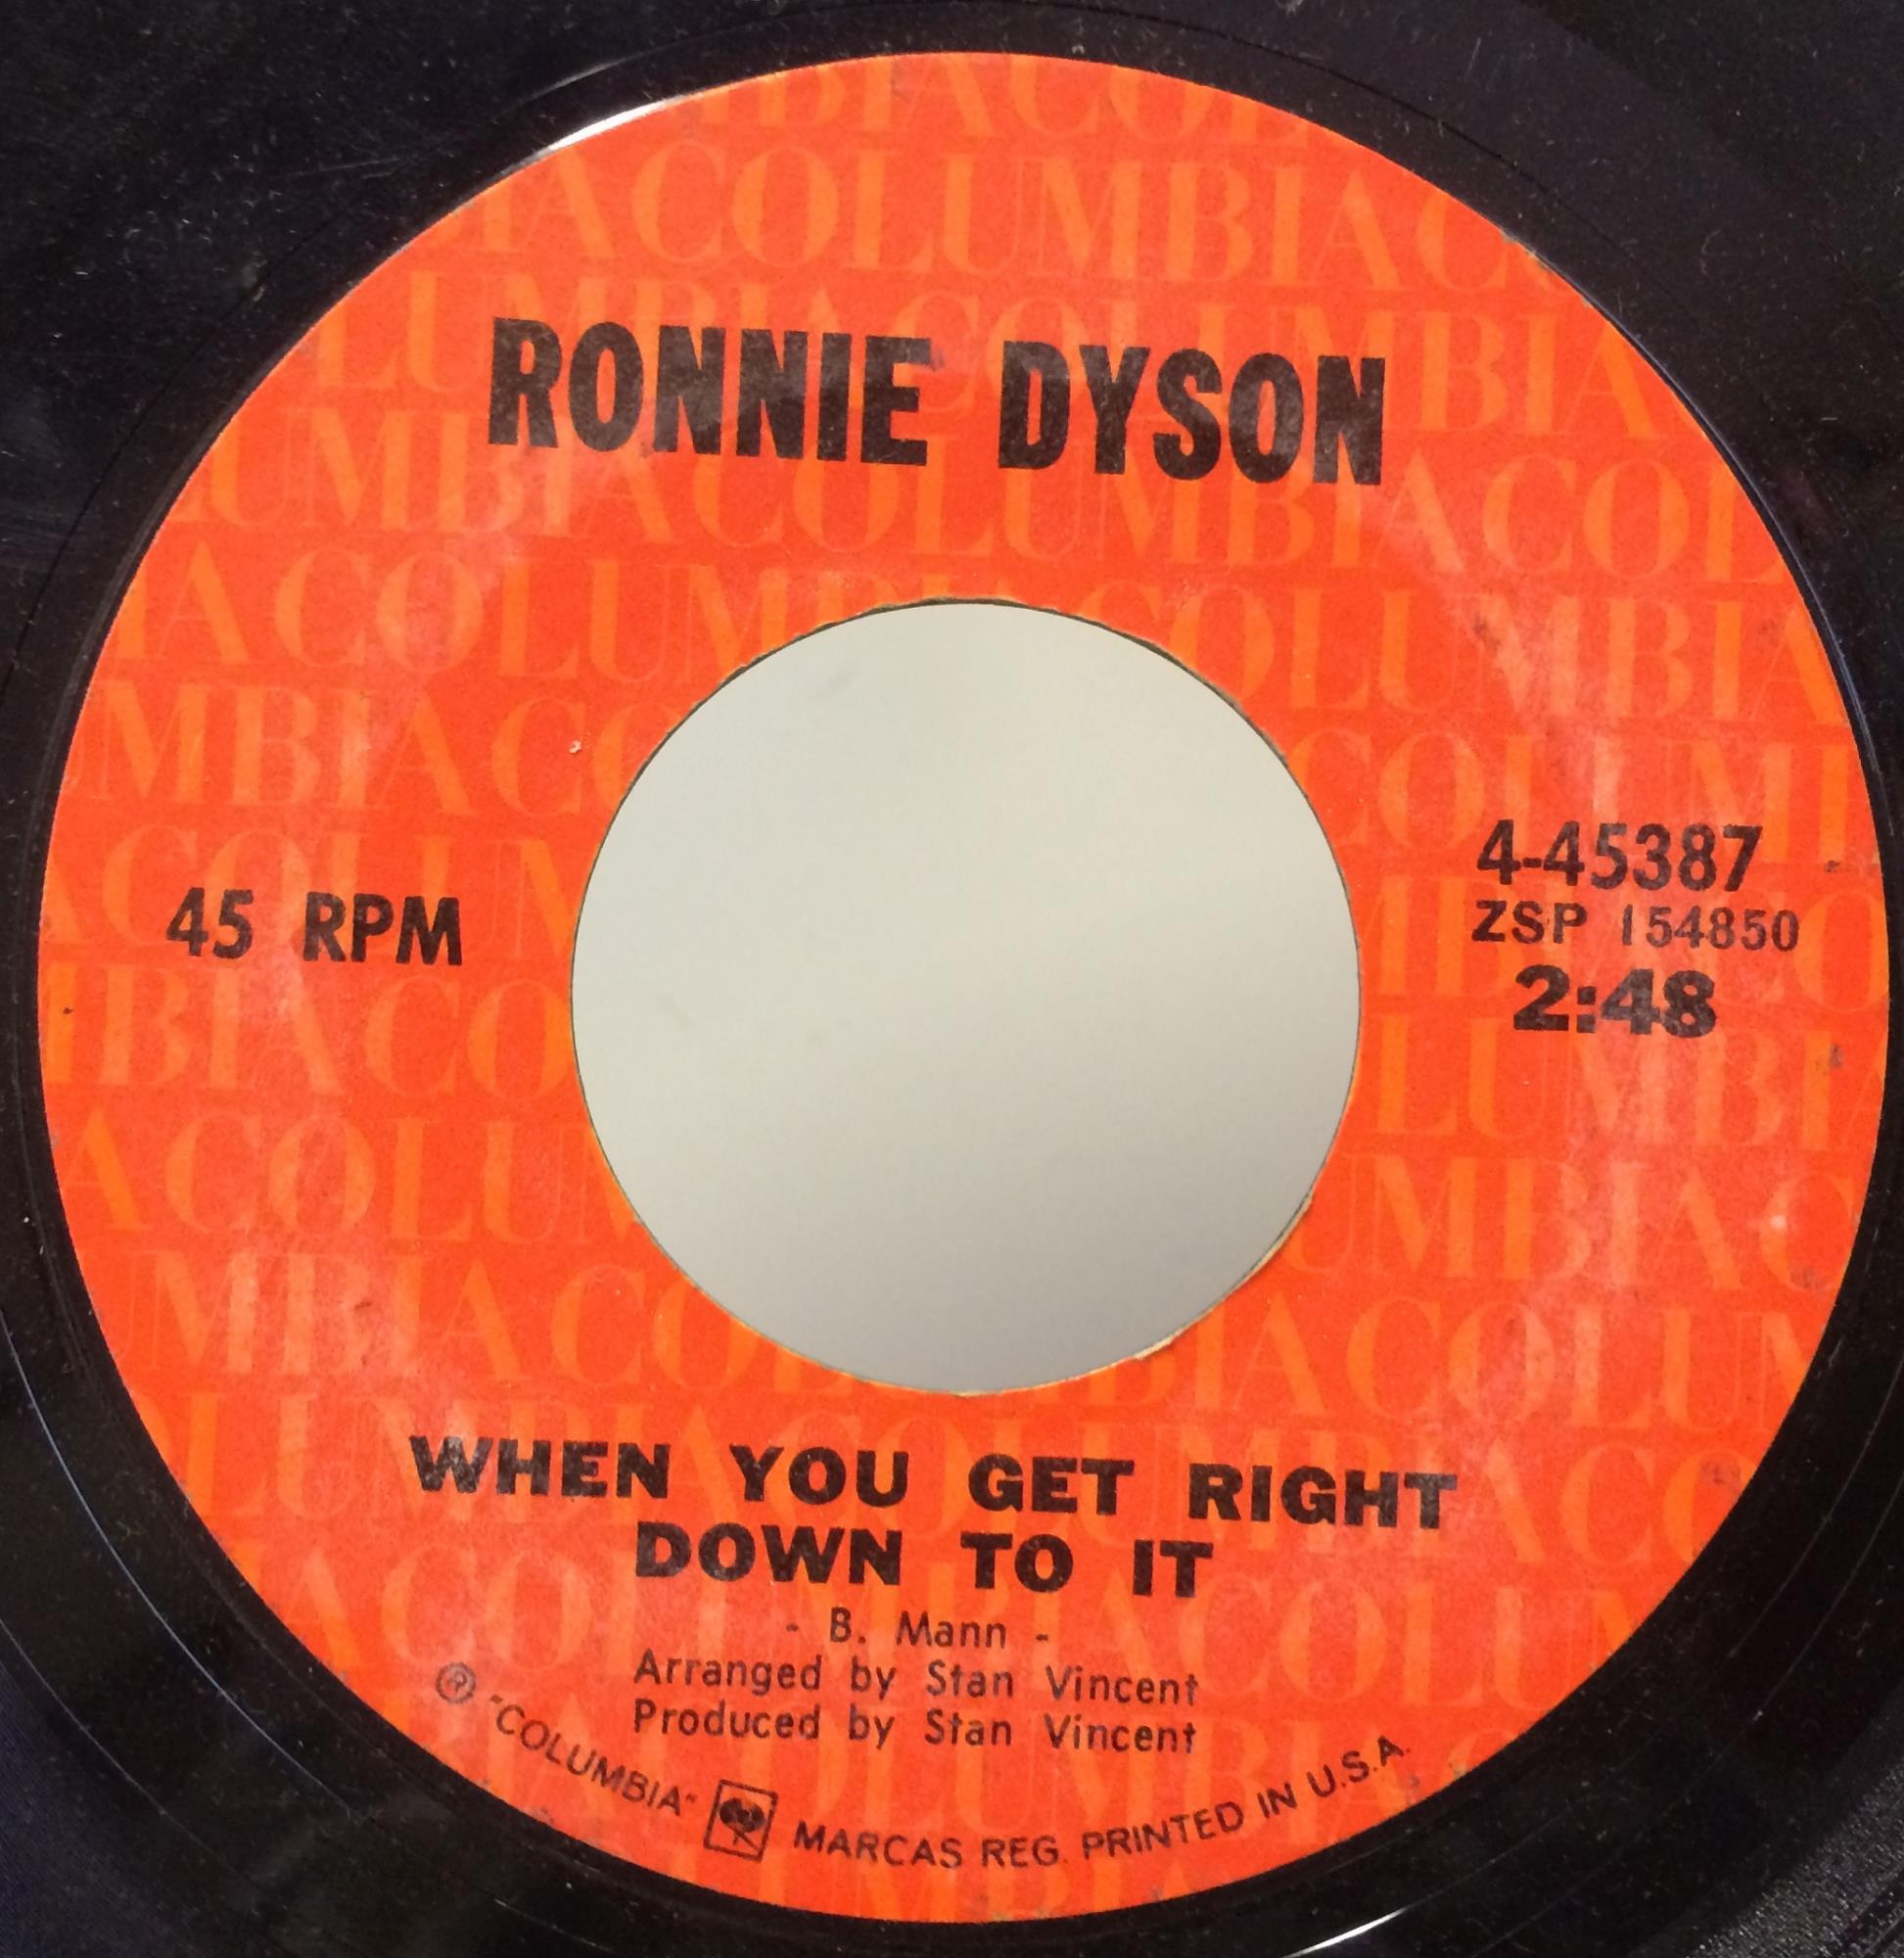 Ronnie Dyson